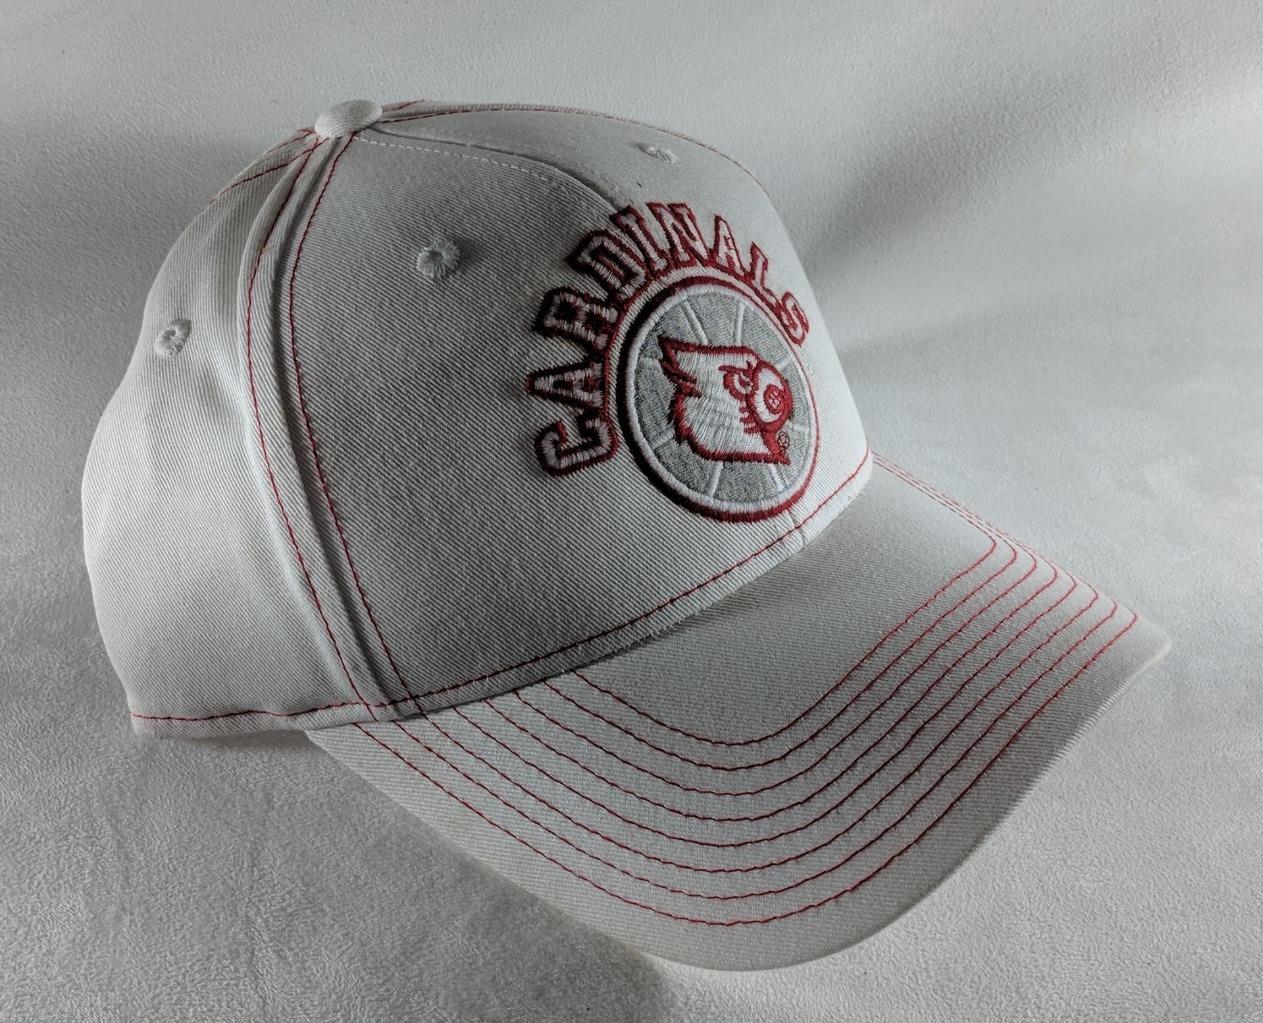 0e17f35ac62 LZ Adidas Adult One Size Louisville Cardinals NCAA Baseball Hat Cap ...